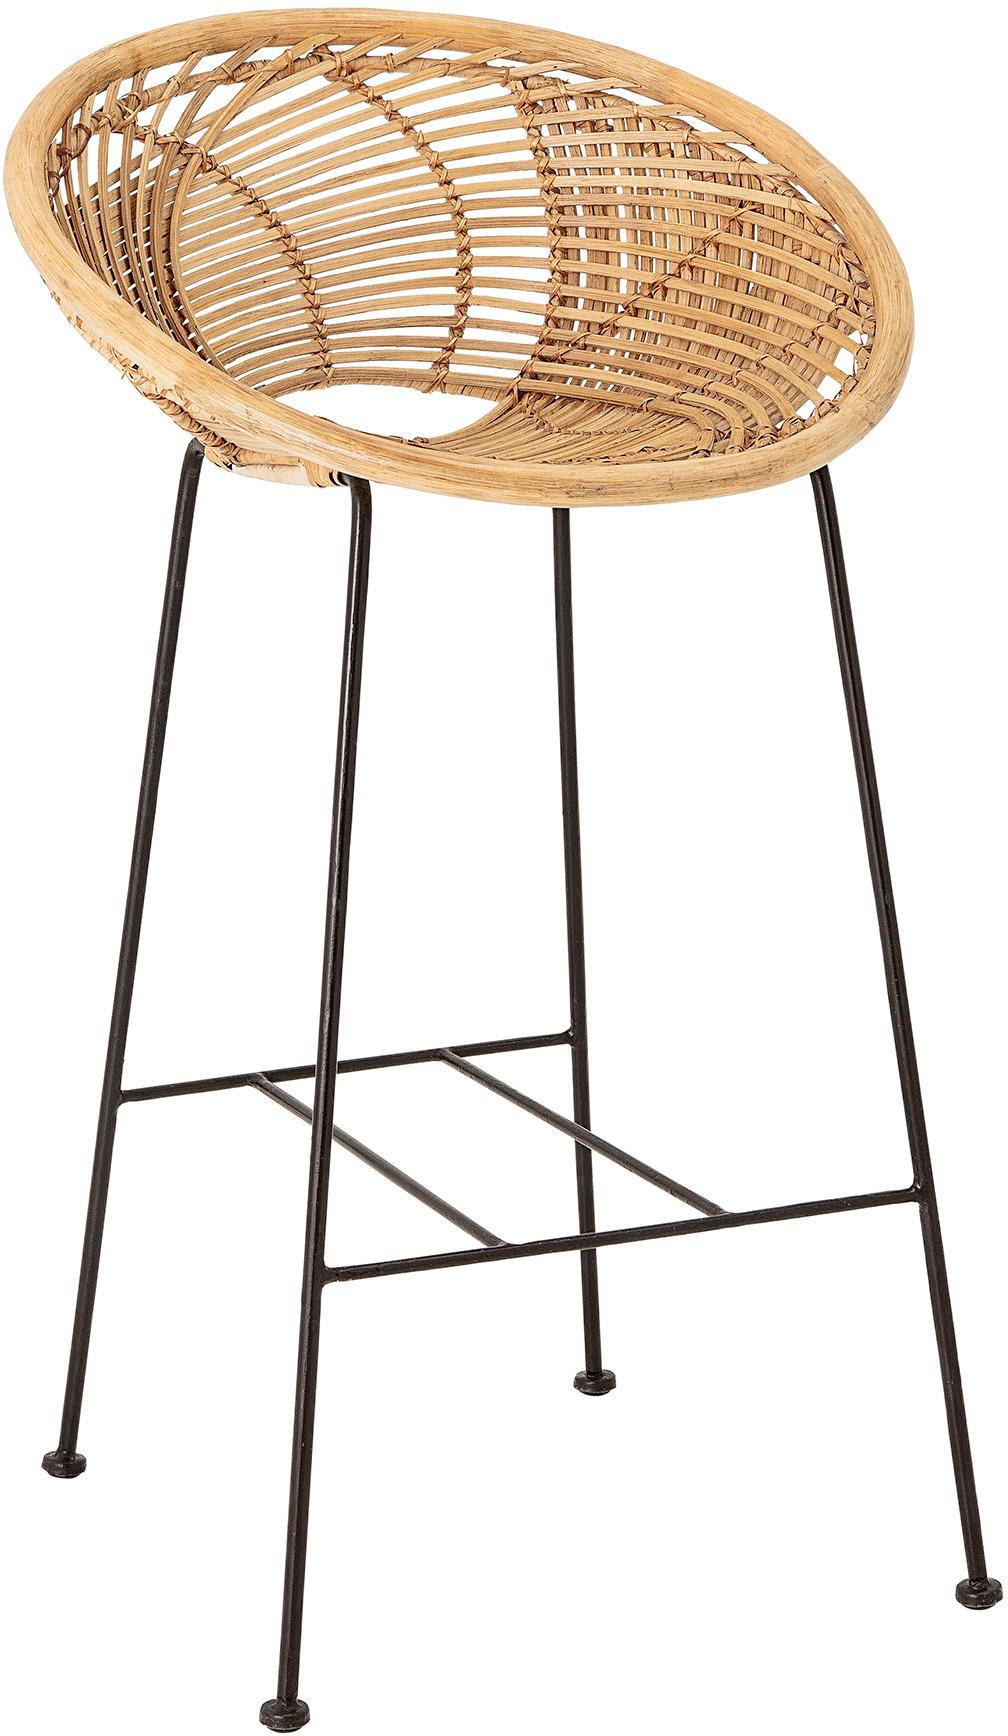 Rotan barkruk Yonne, Zitvlak: rotan, Frame: gecoat metaal, Rotan, zwart, 52 x 94 cm